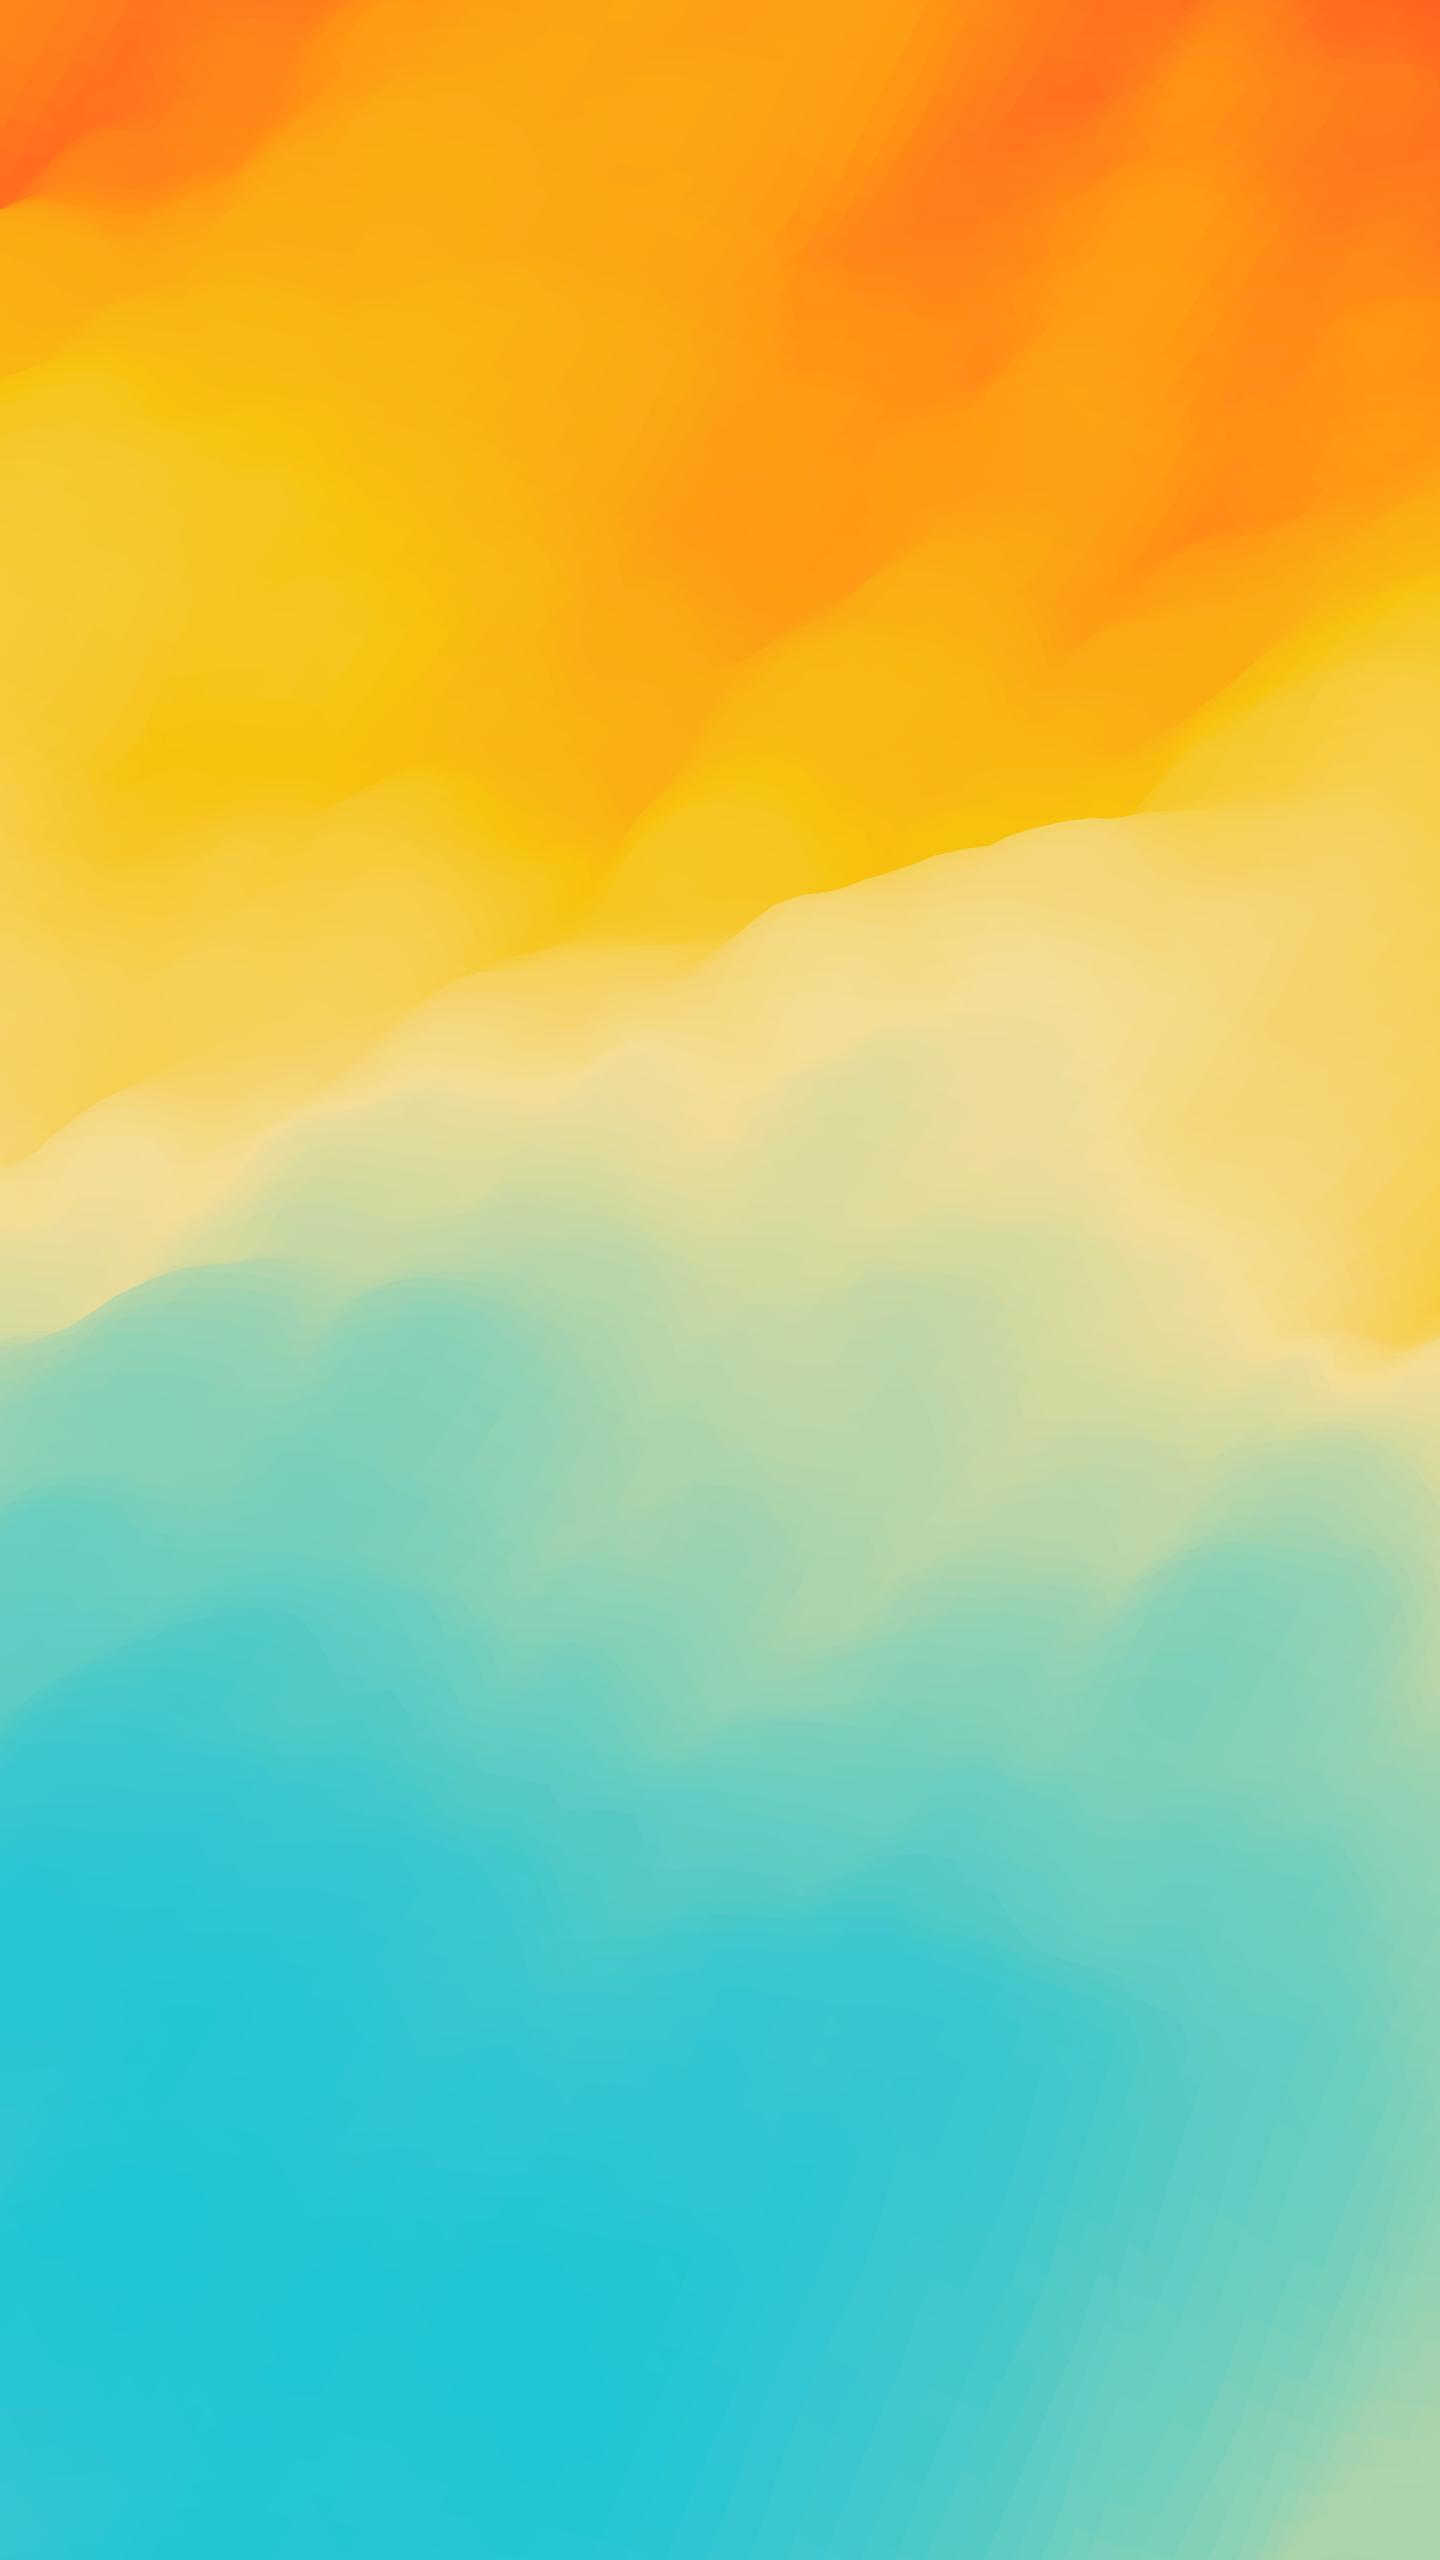 Dark Teal And Orange Wallpaper